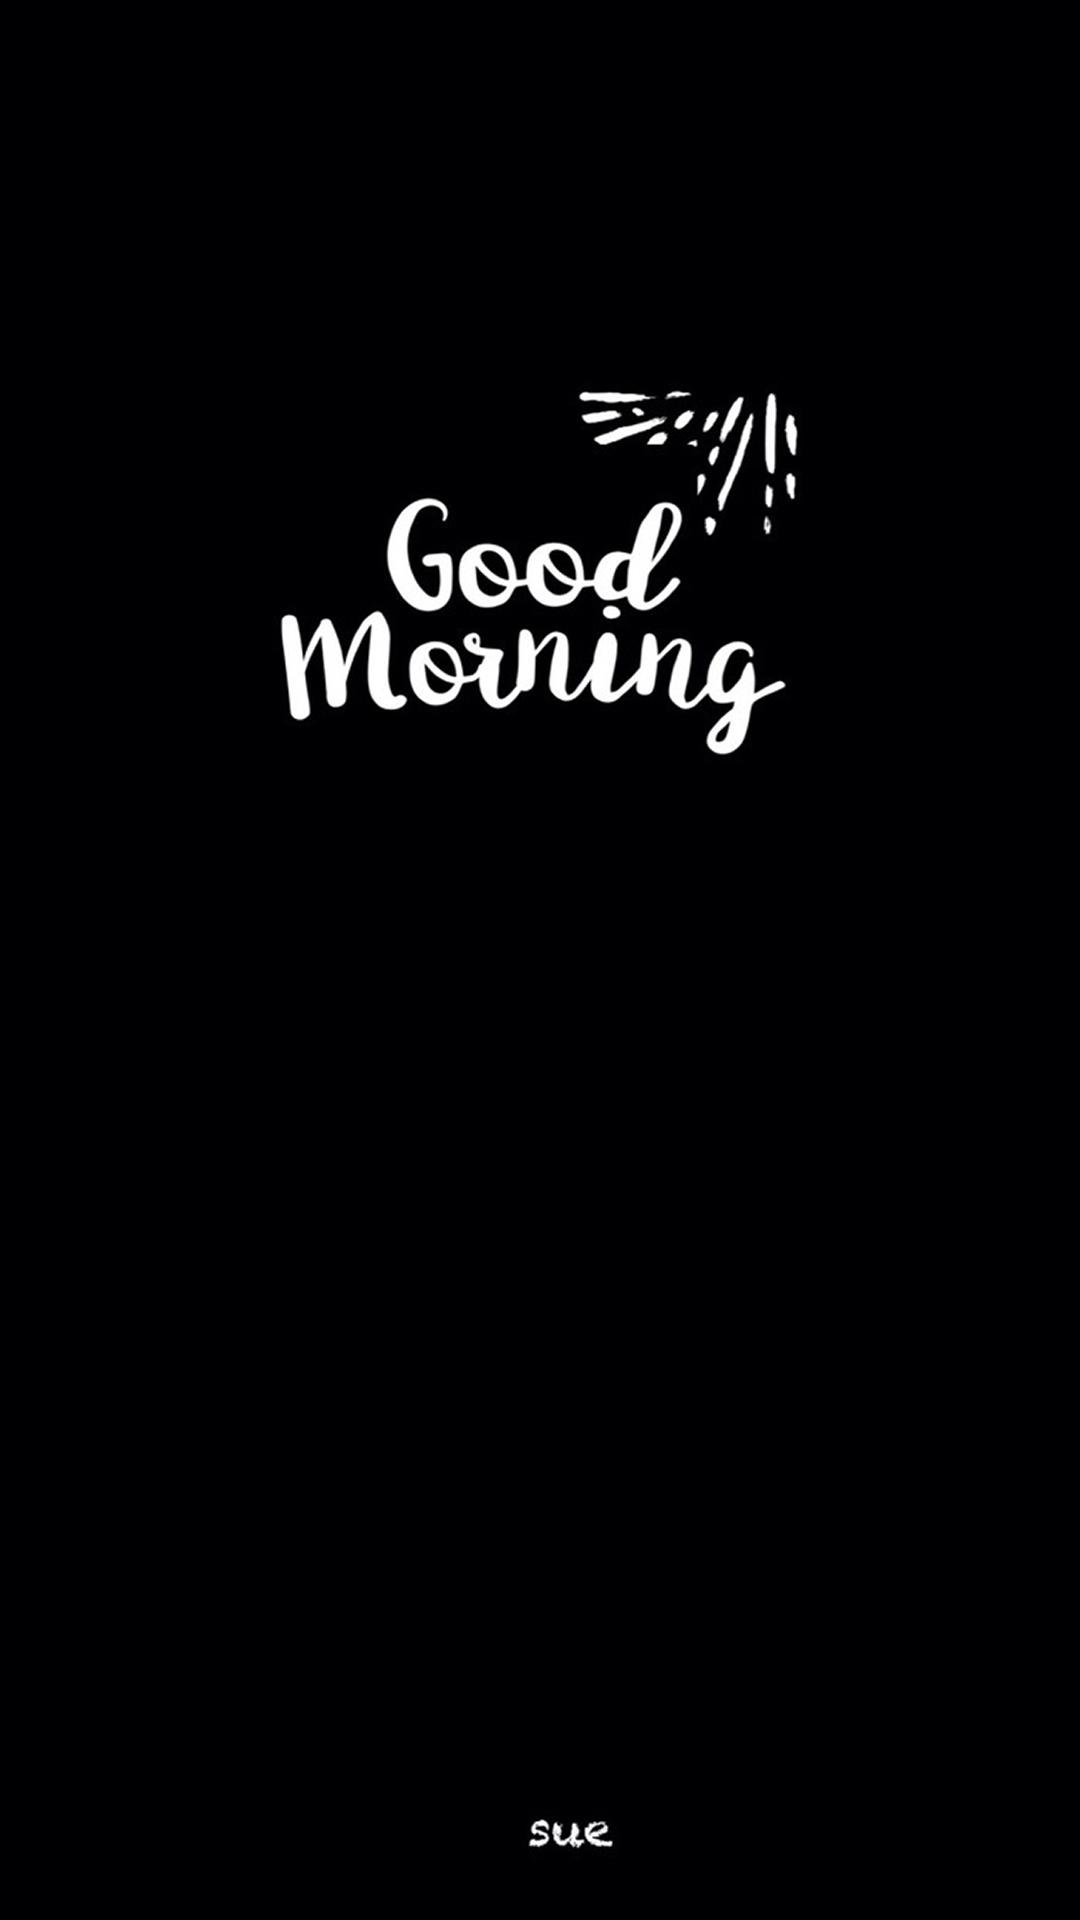 good morning 早上好 黑白 字体设计 英文图片